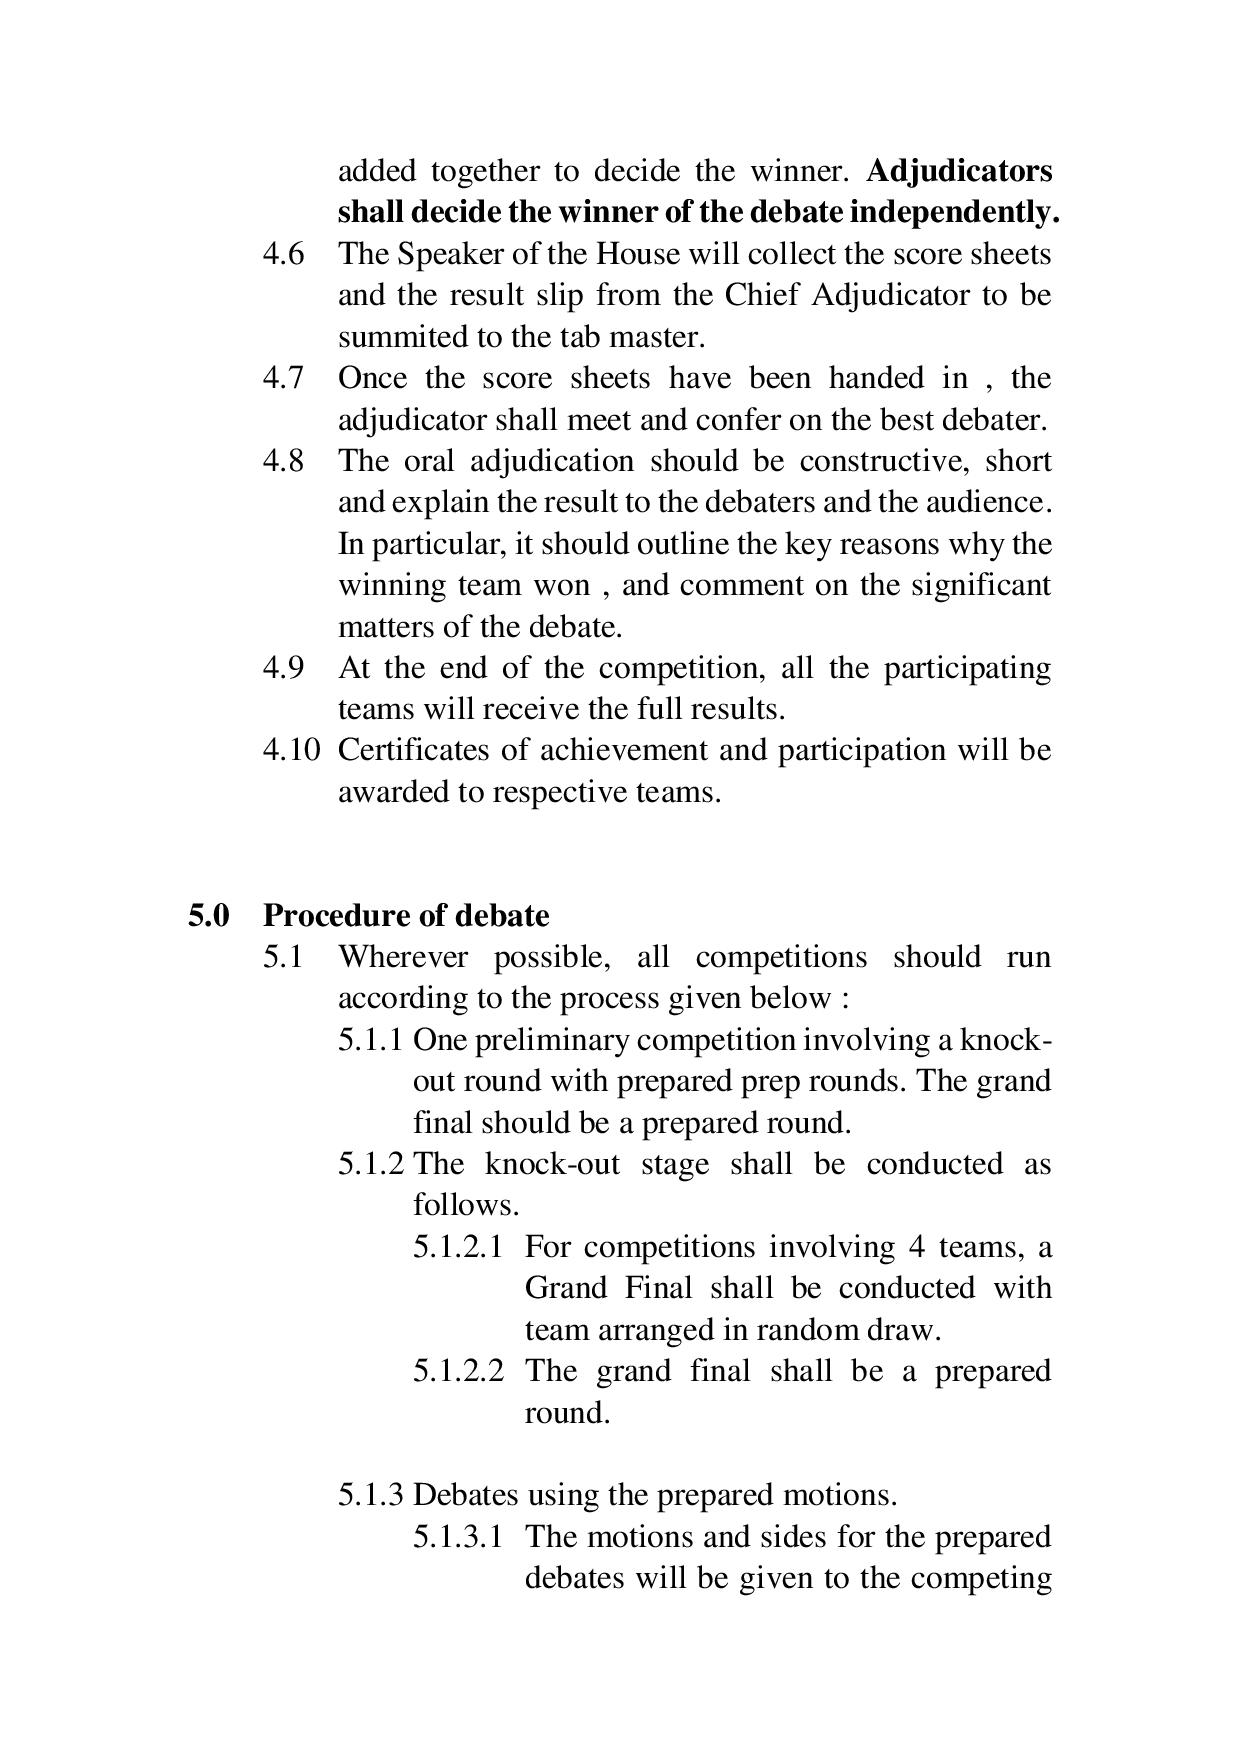 MALAYSIAN DENTAL INTERVARSITY DEBATE COMPETITION (Edited)-page-004.jpg